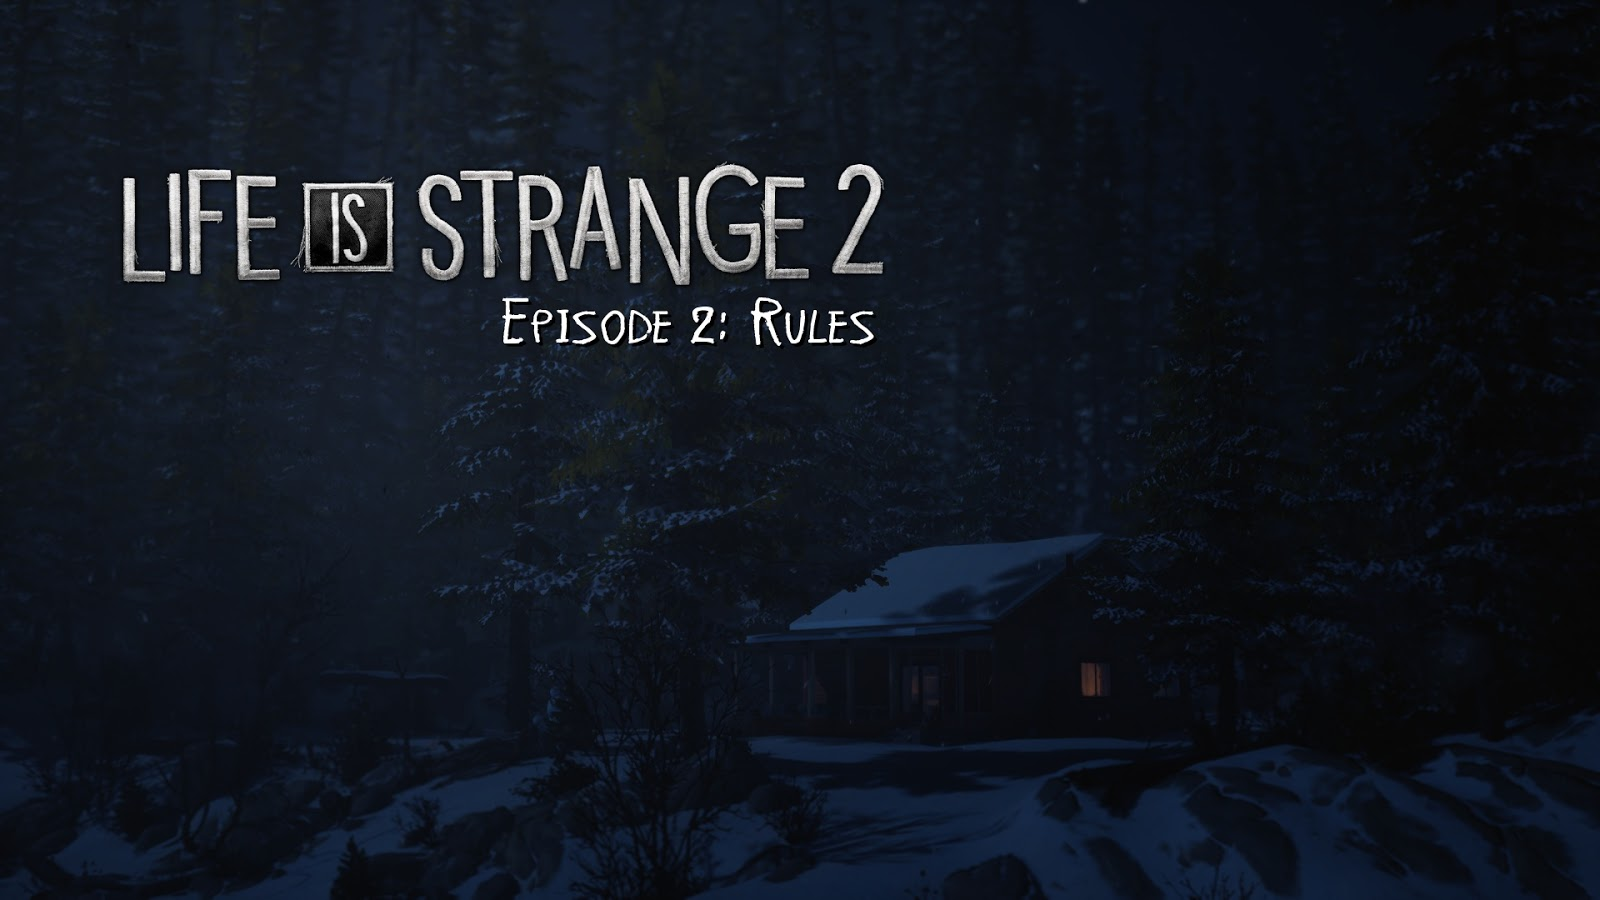 Life Is Strange 2 - Episode 2: Rules